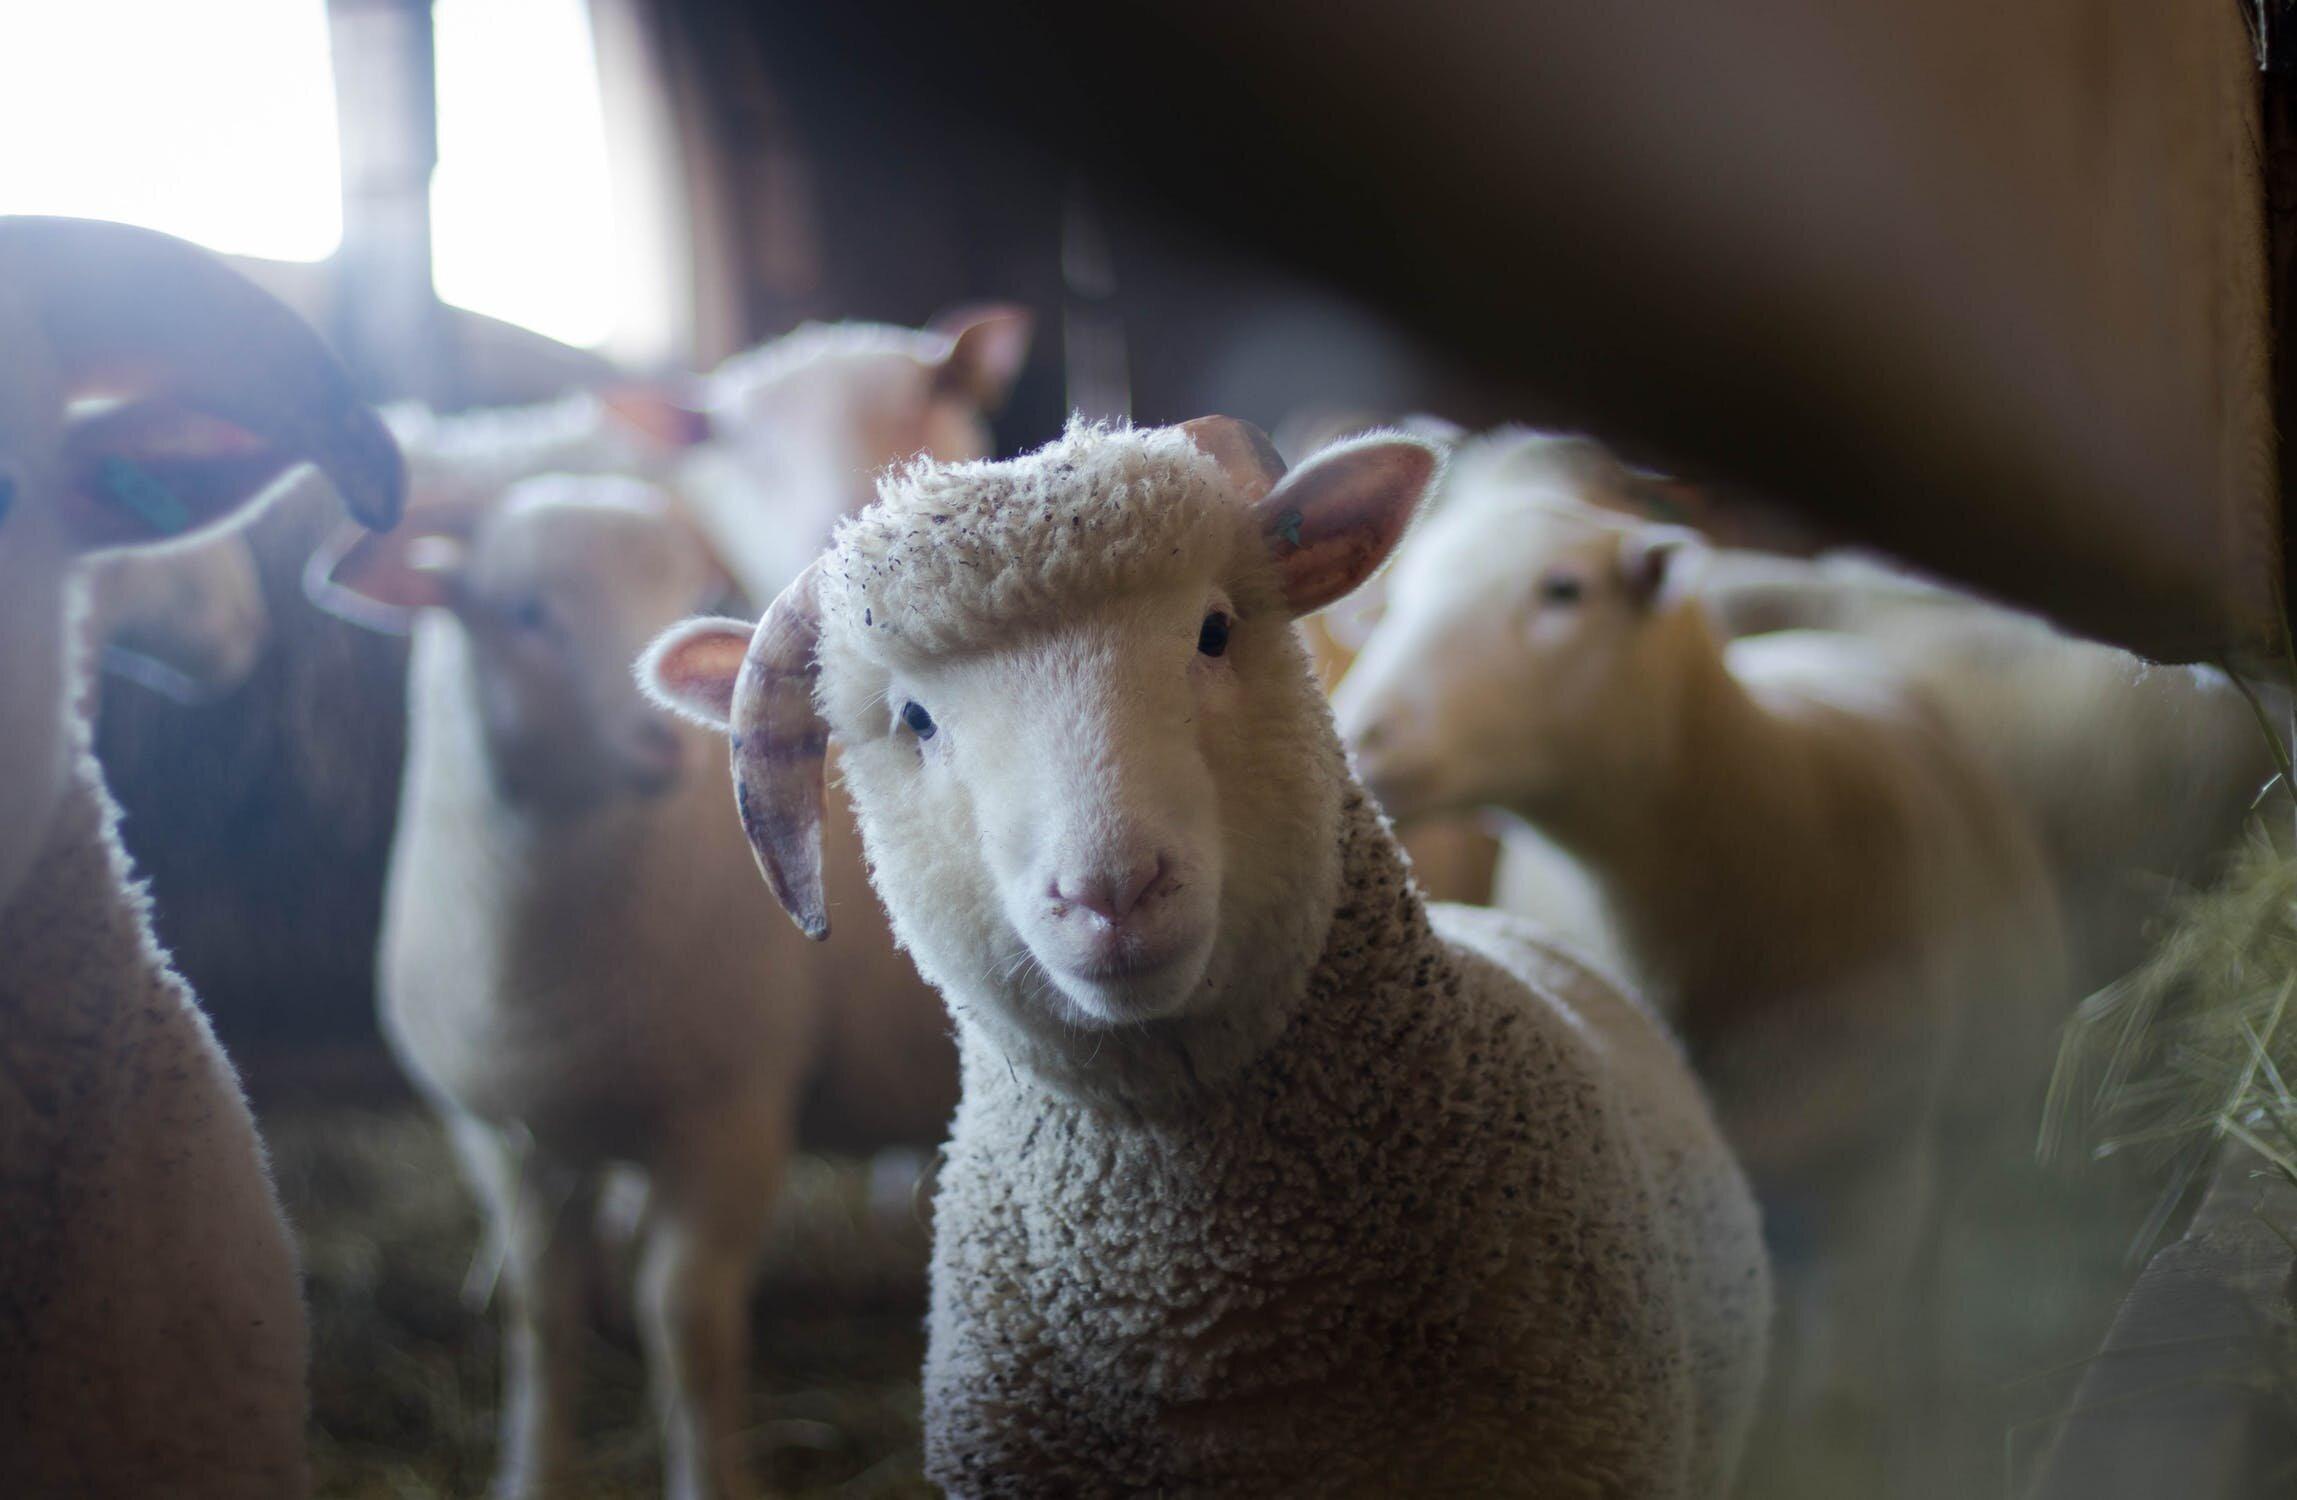 pexels-photo-288621 sheep.jpeg